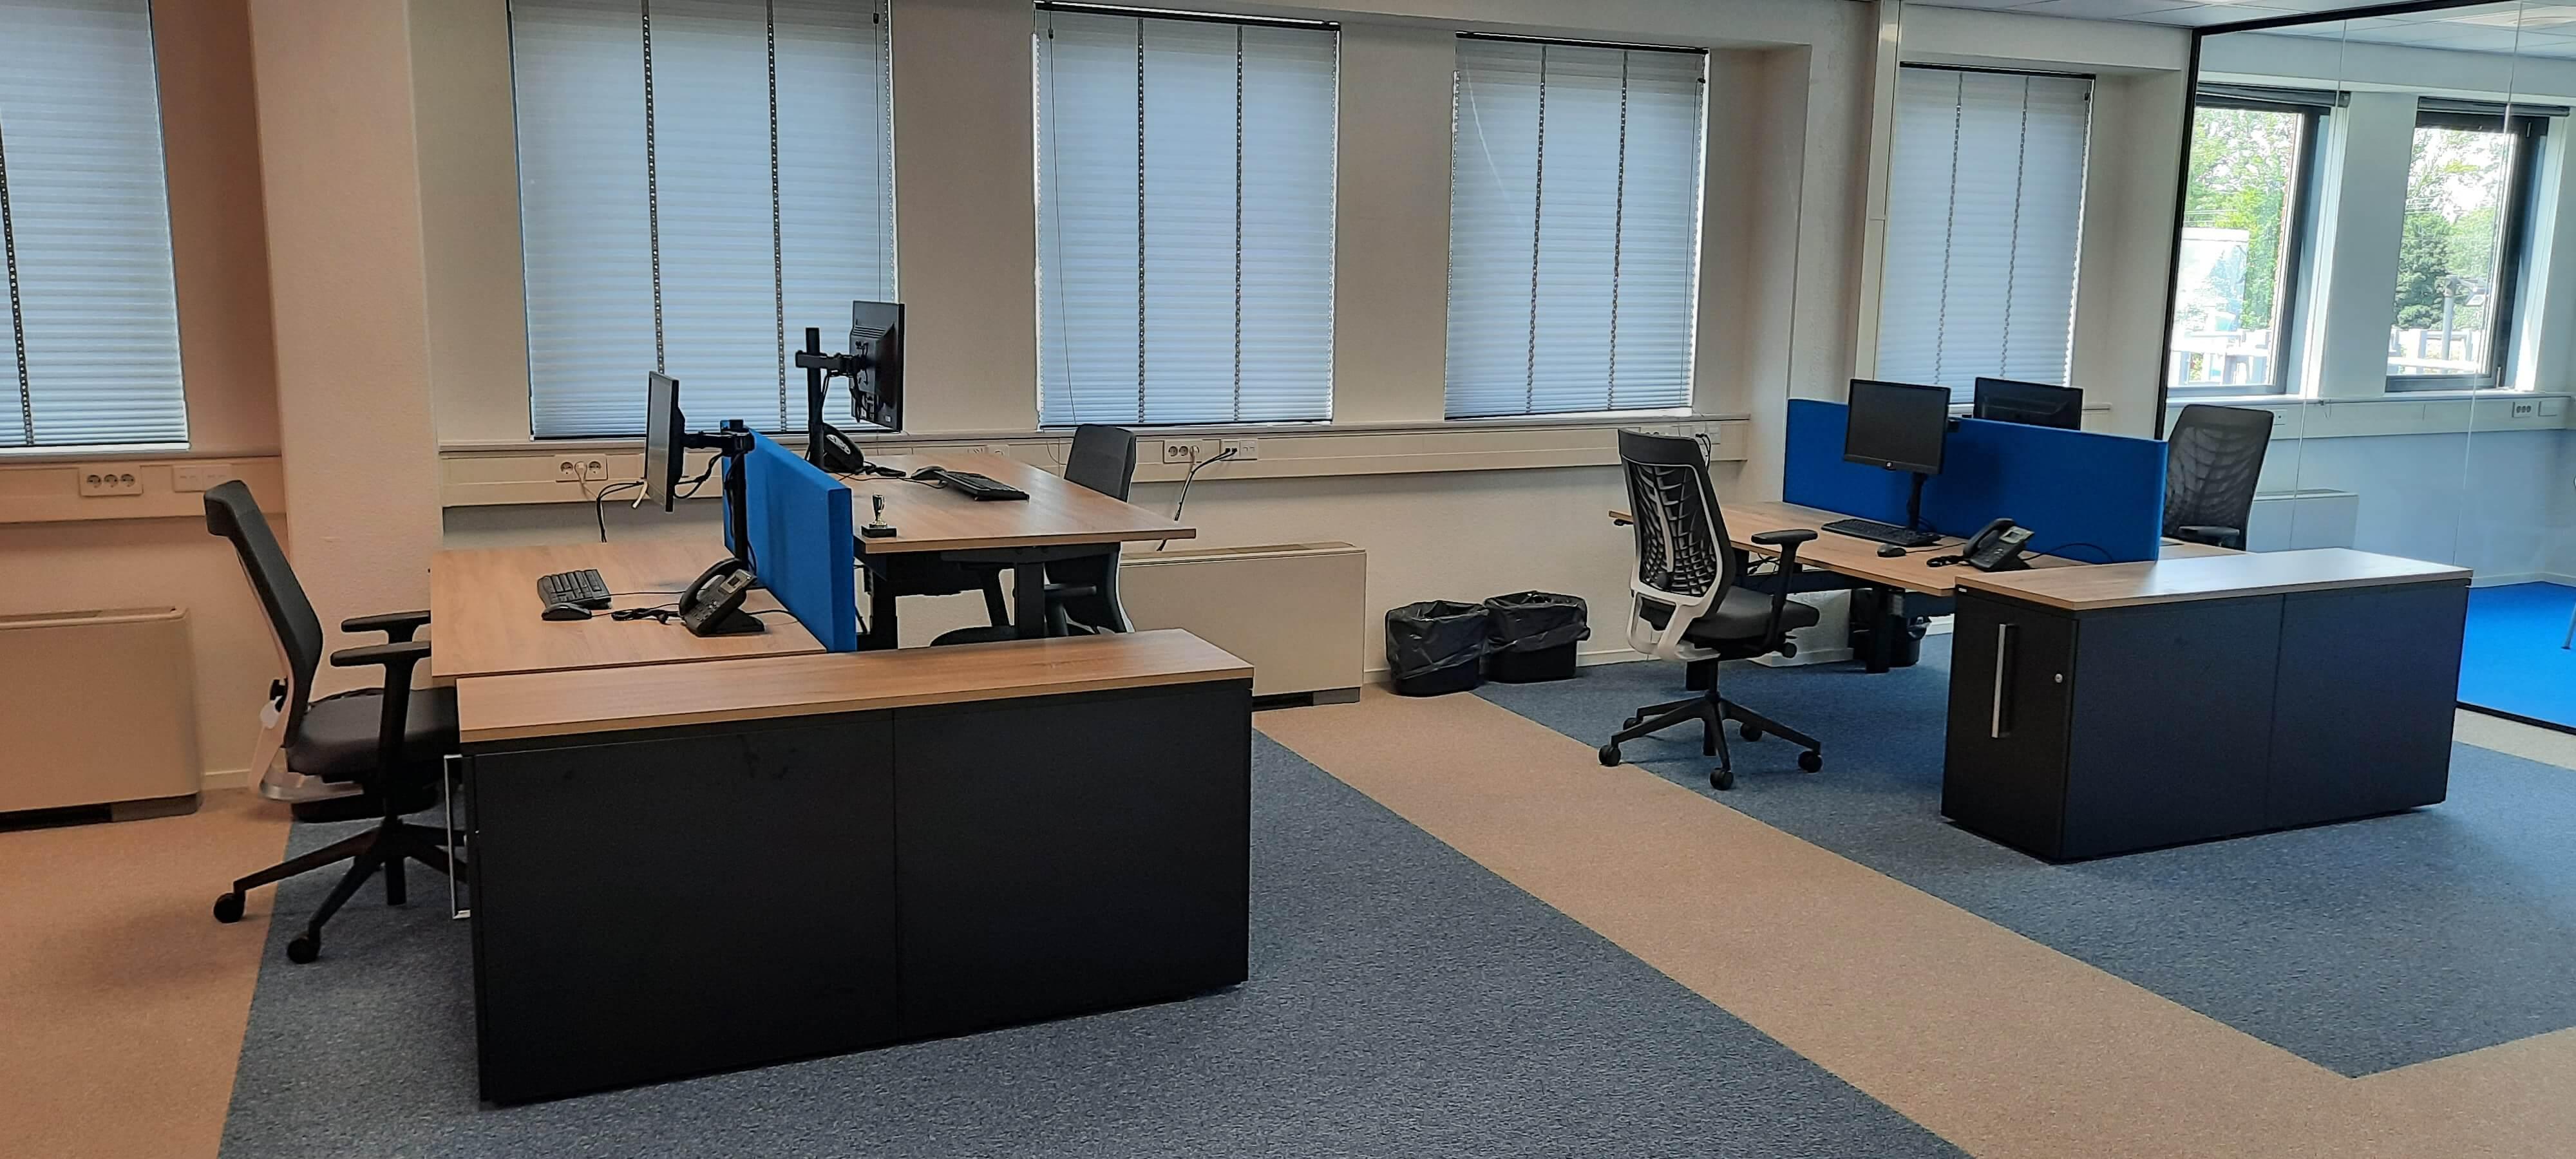 afdeling met bureau werkplekken